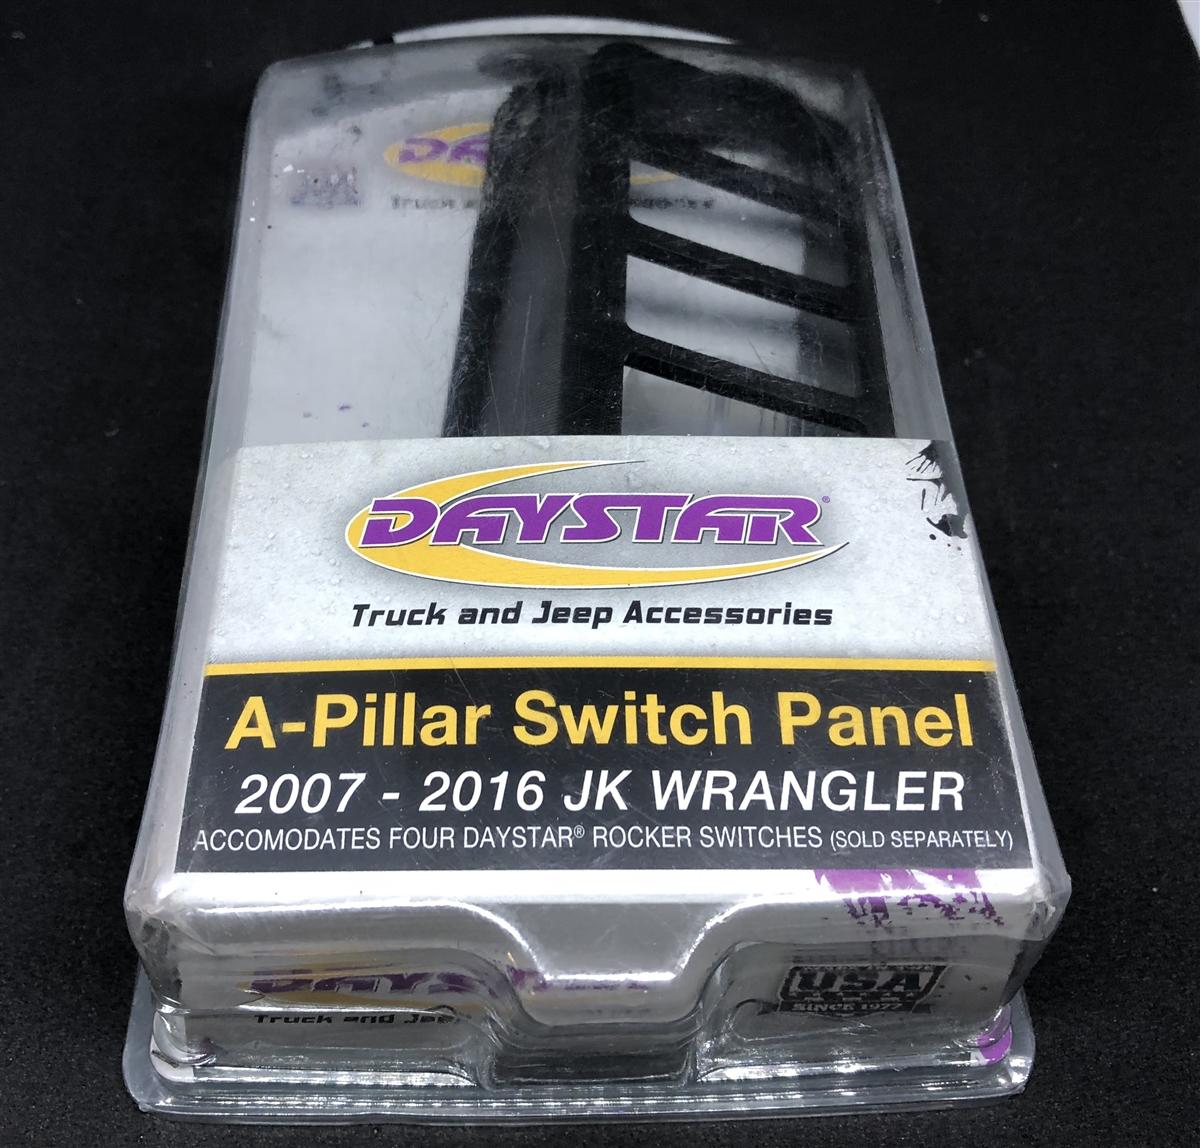 Daystar Kj71055bk A Pillar Switch Pod Fits 07 17 Wrangler Jk Jeep Dash Switches